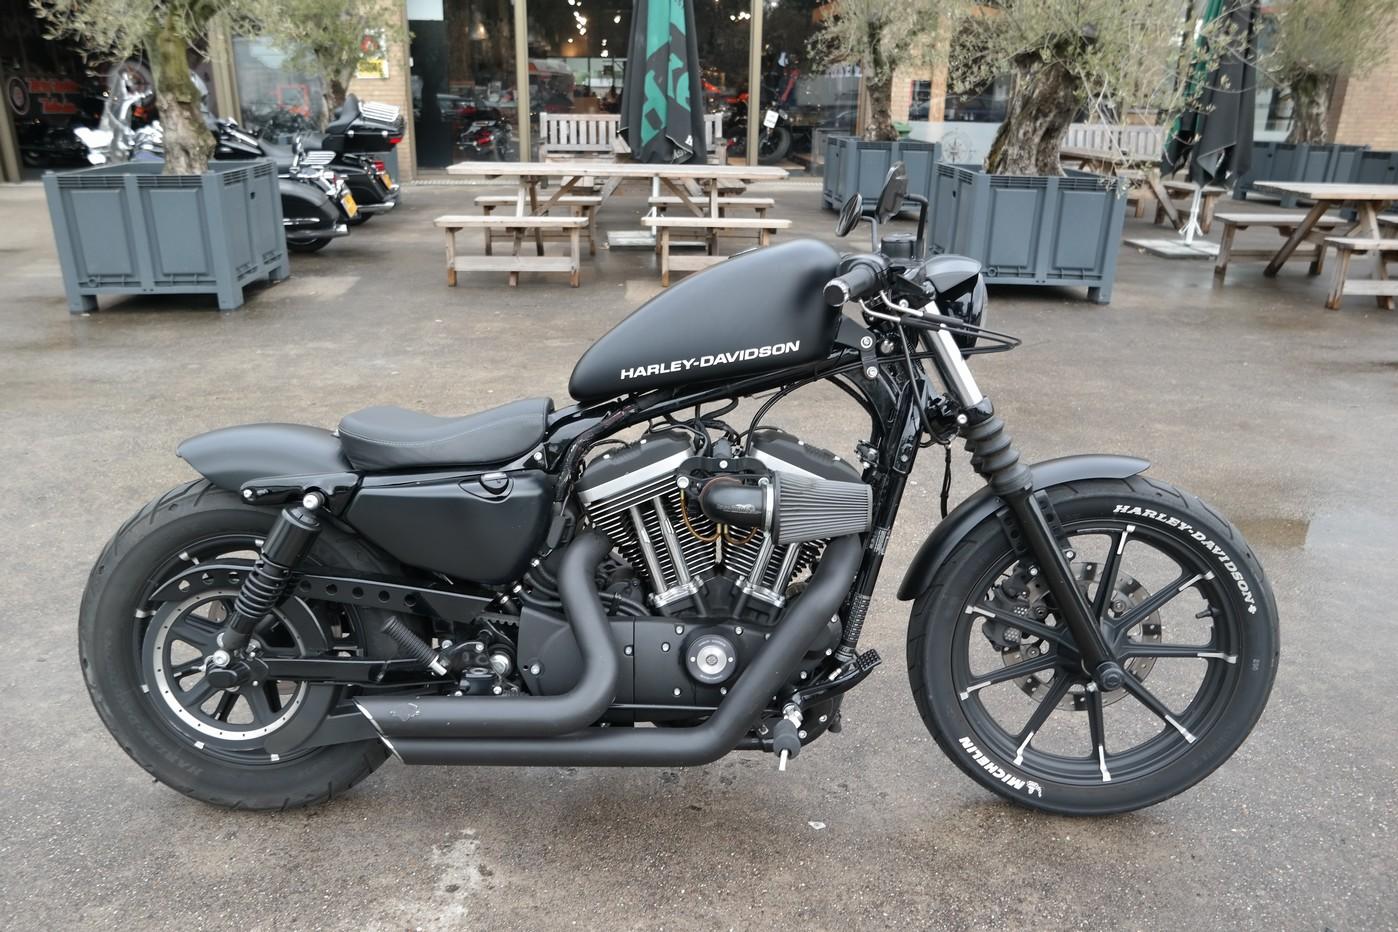 HARLEY-DAVIDSON - XL 883 N ABS Iron